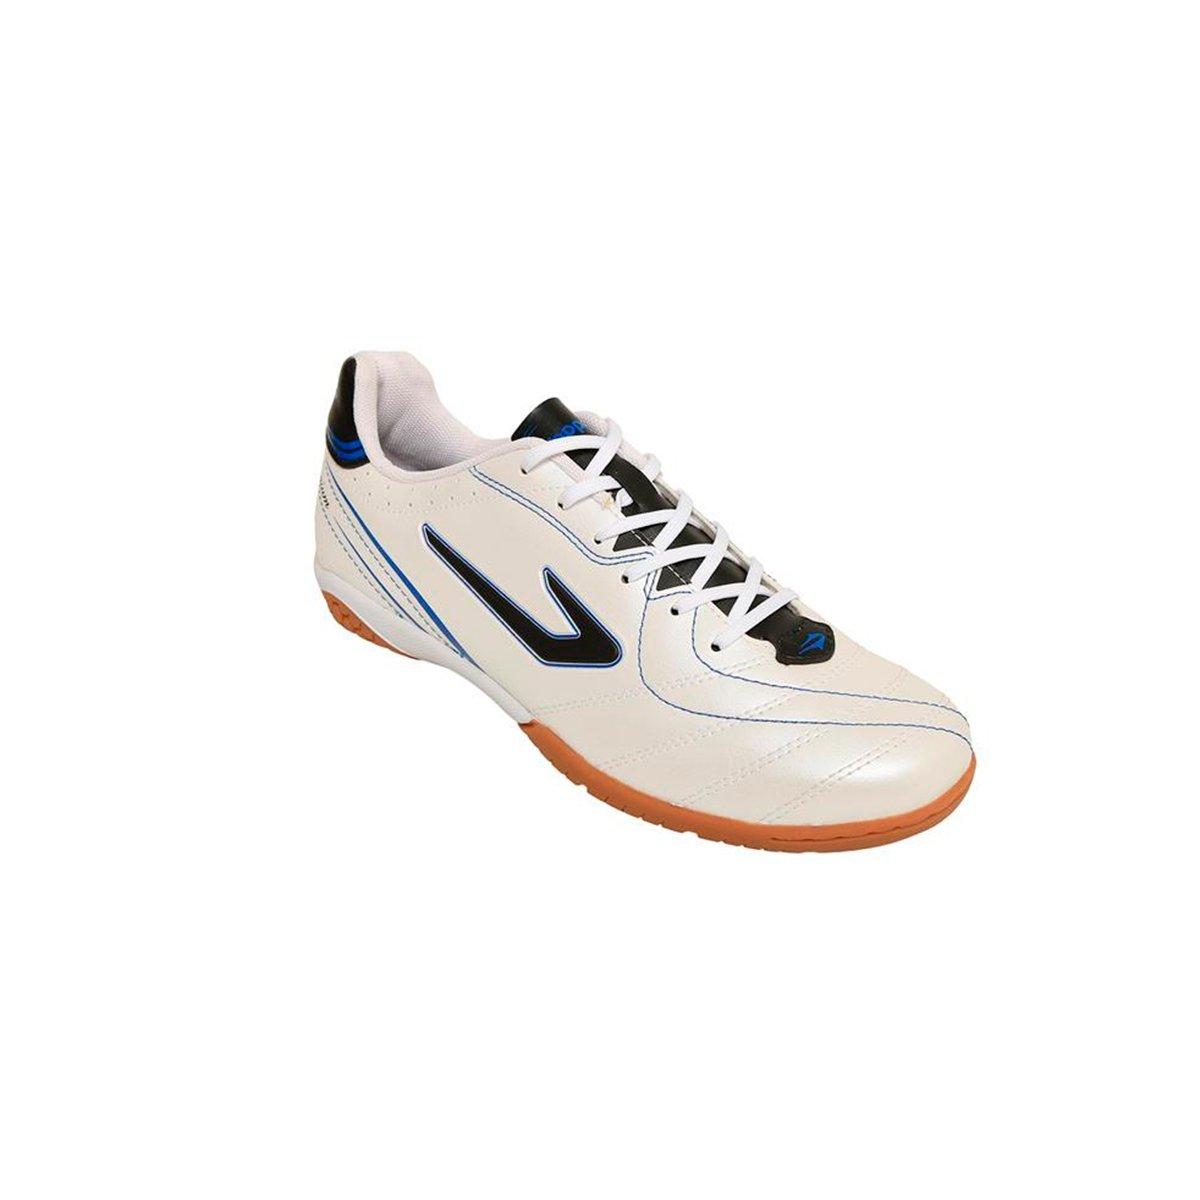 40c743a28589a Chuteira Titanium Futsal Topper - Compre Agora